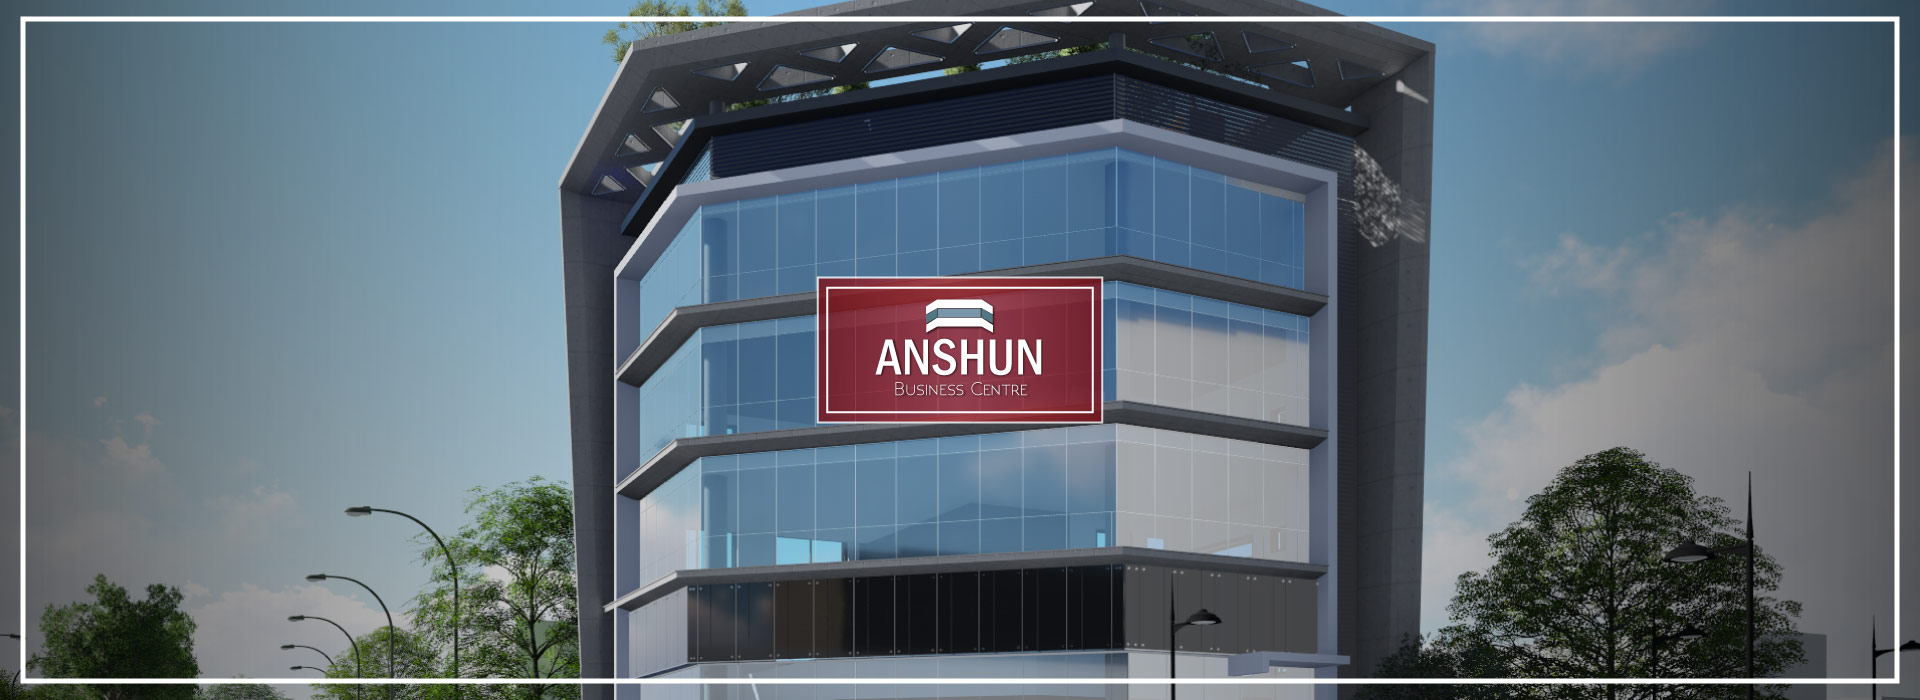 ANSHUN